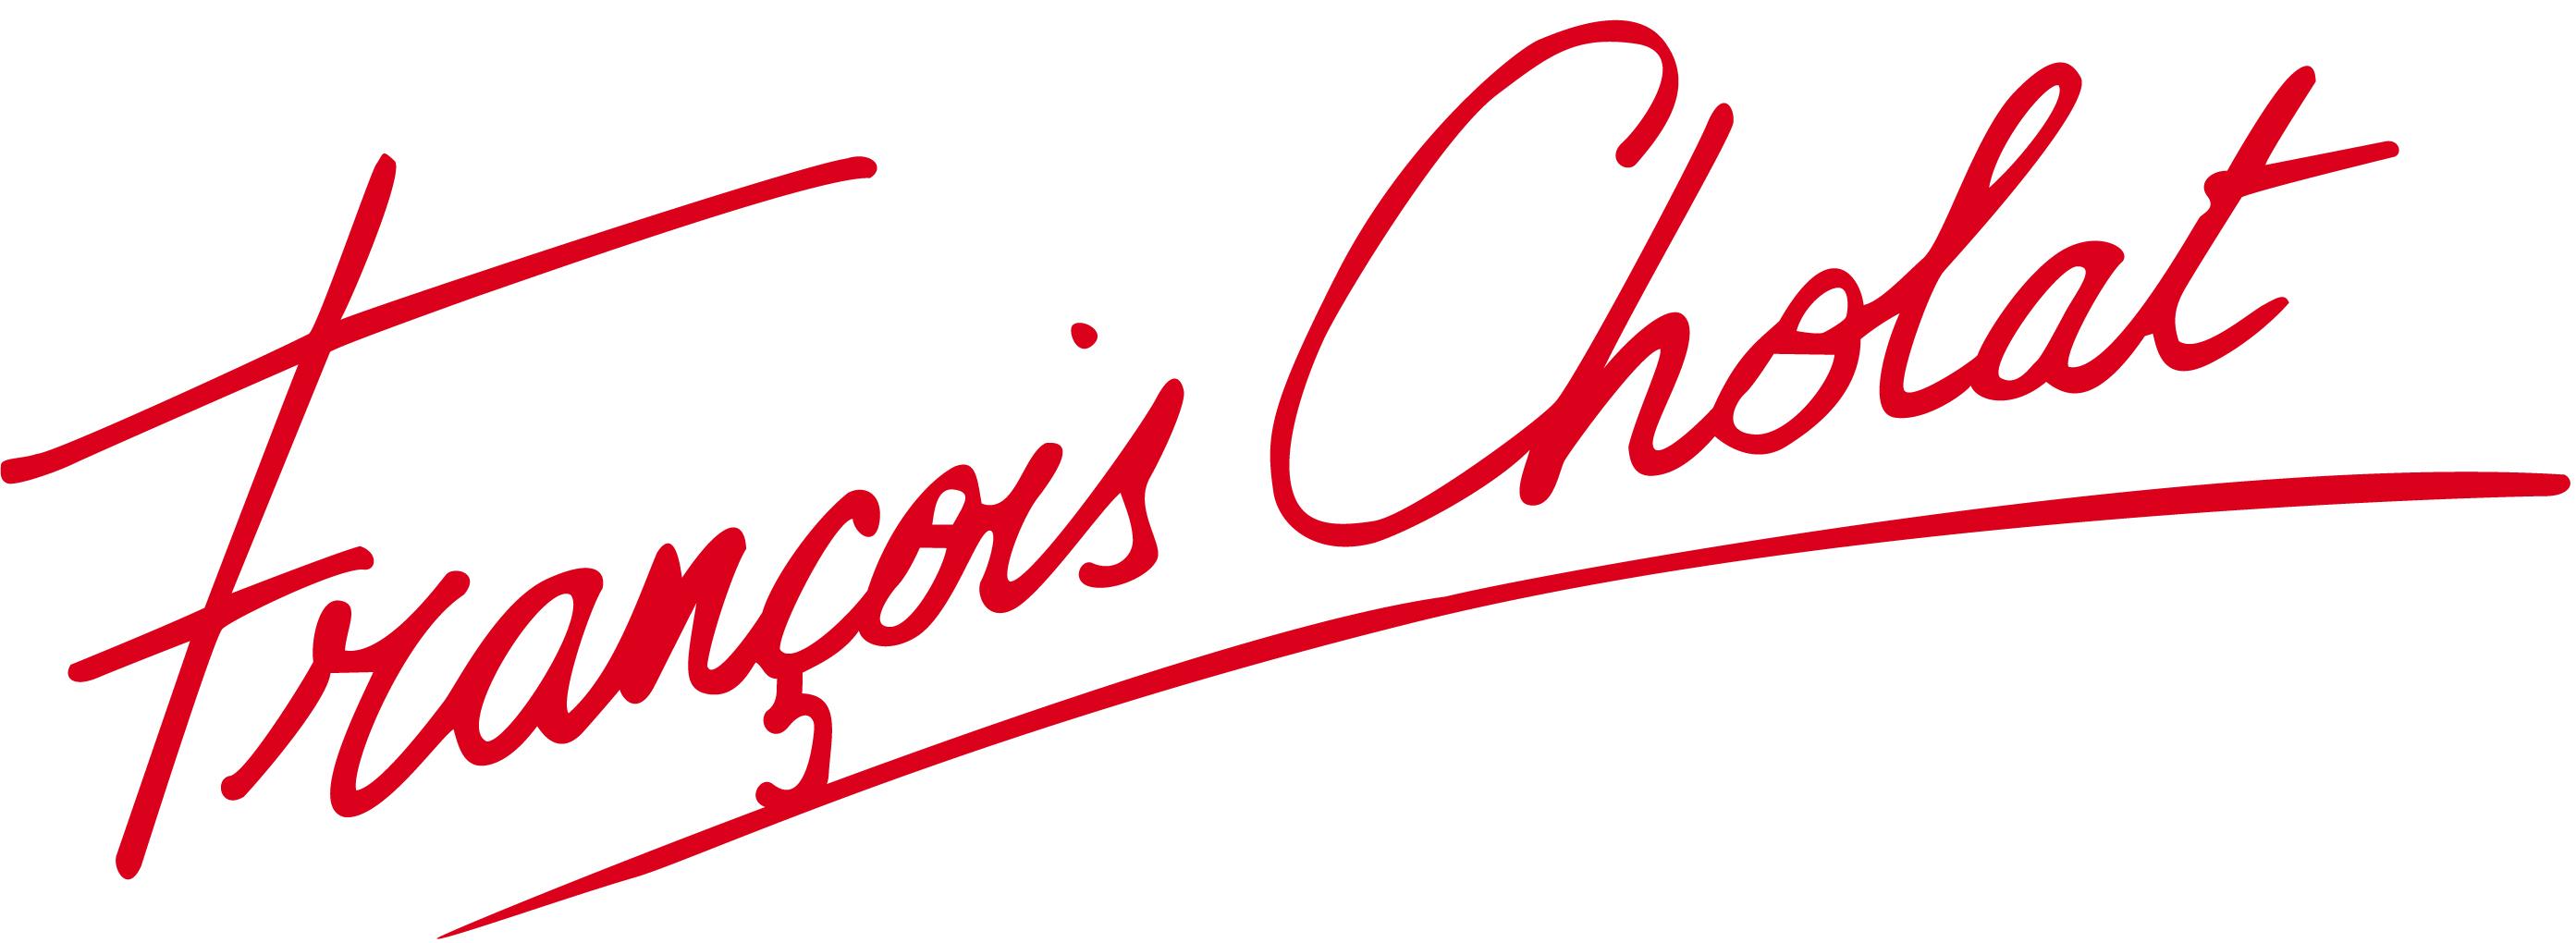 François CHOLAT